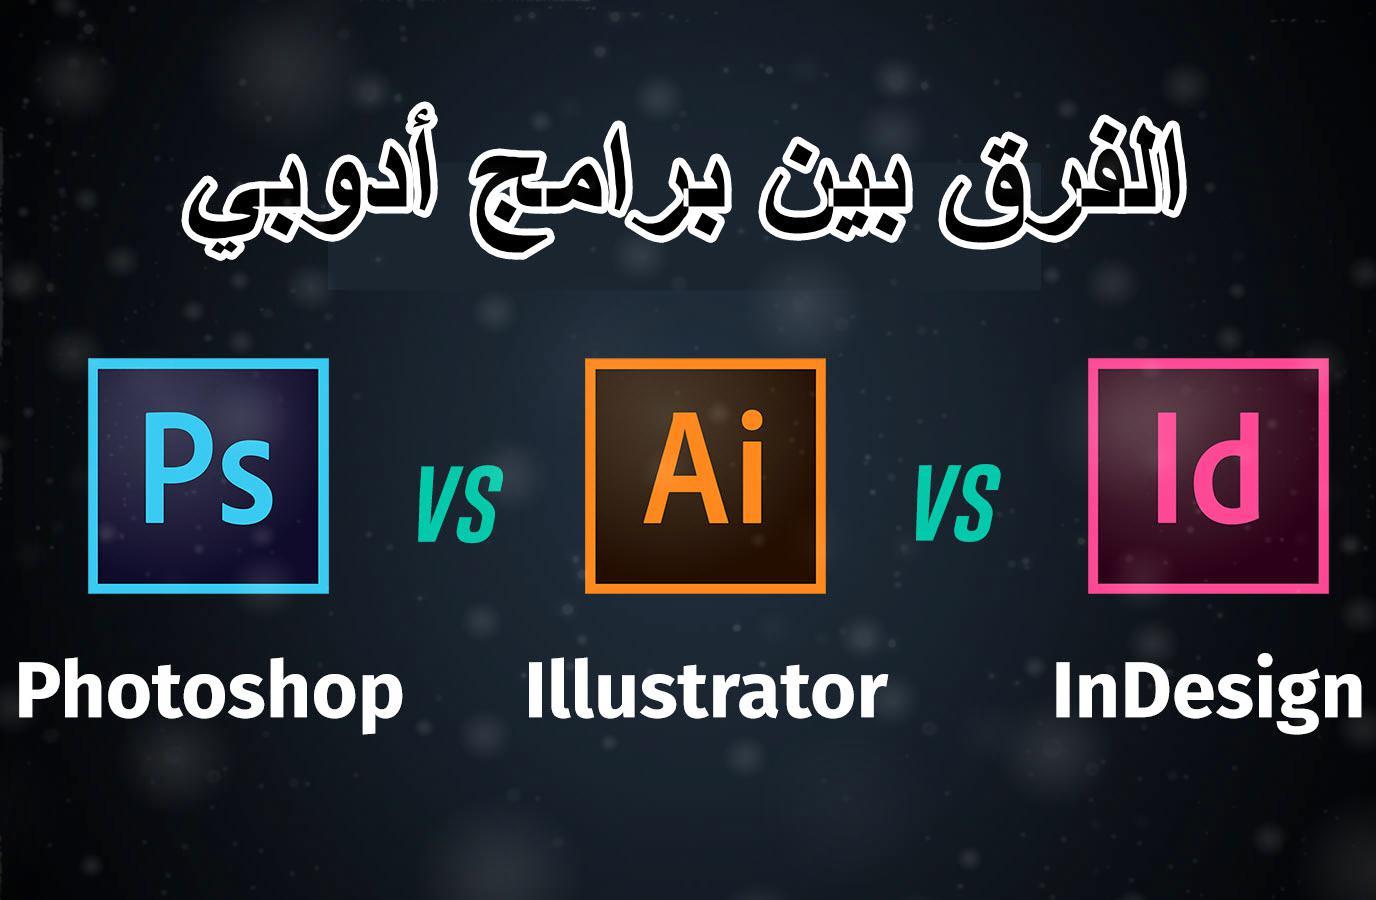 بين Photoshop و Illustrator و InDesign - موبي زووم